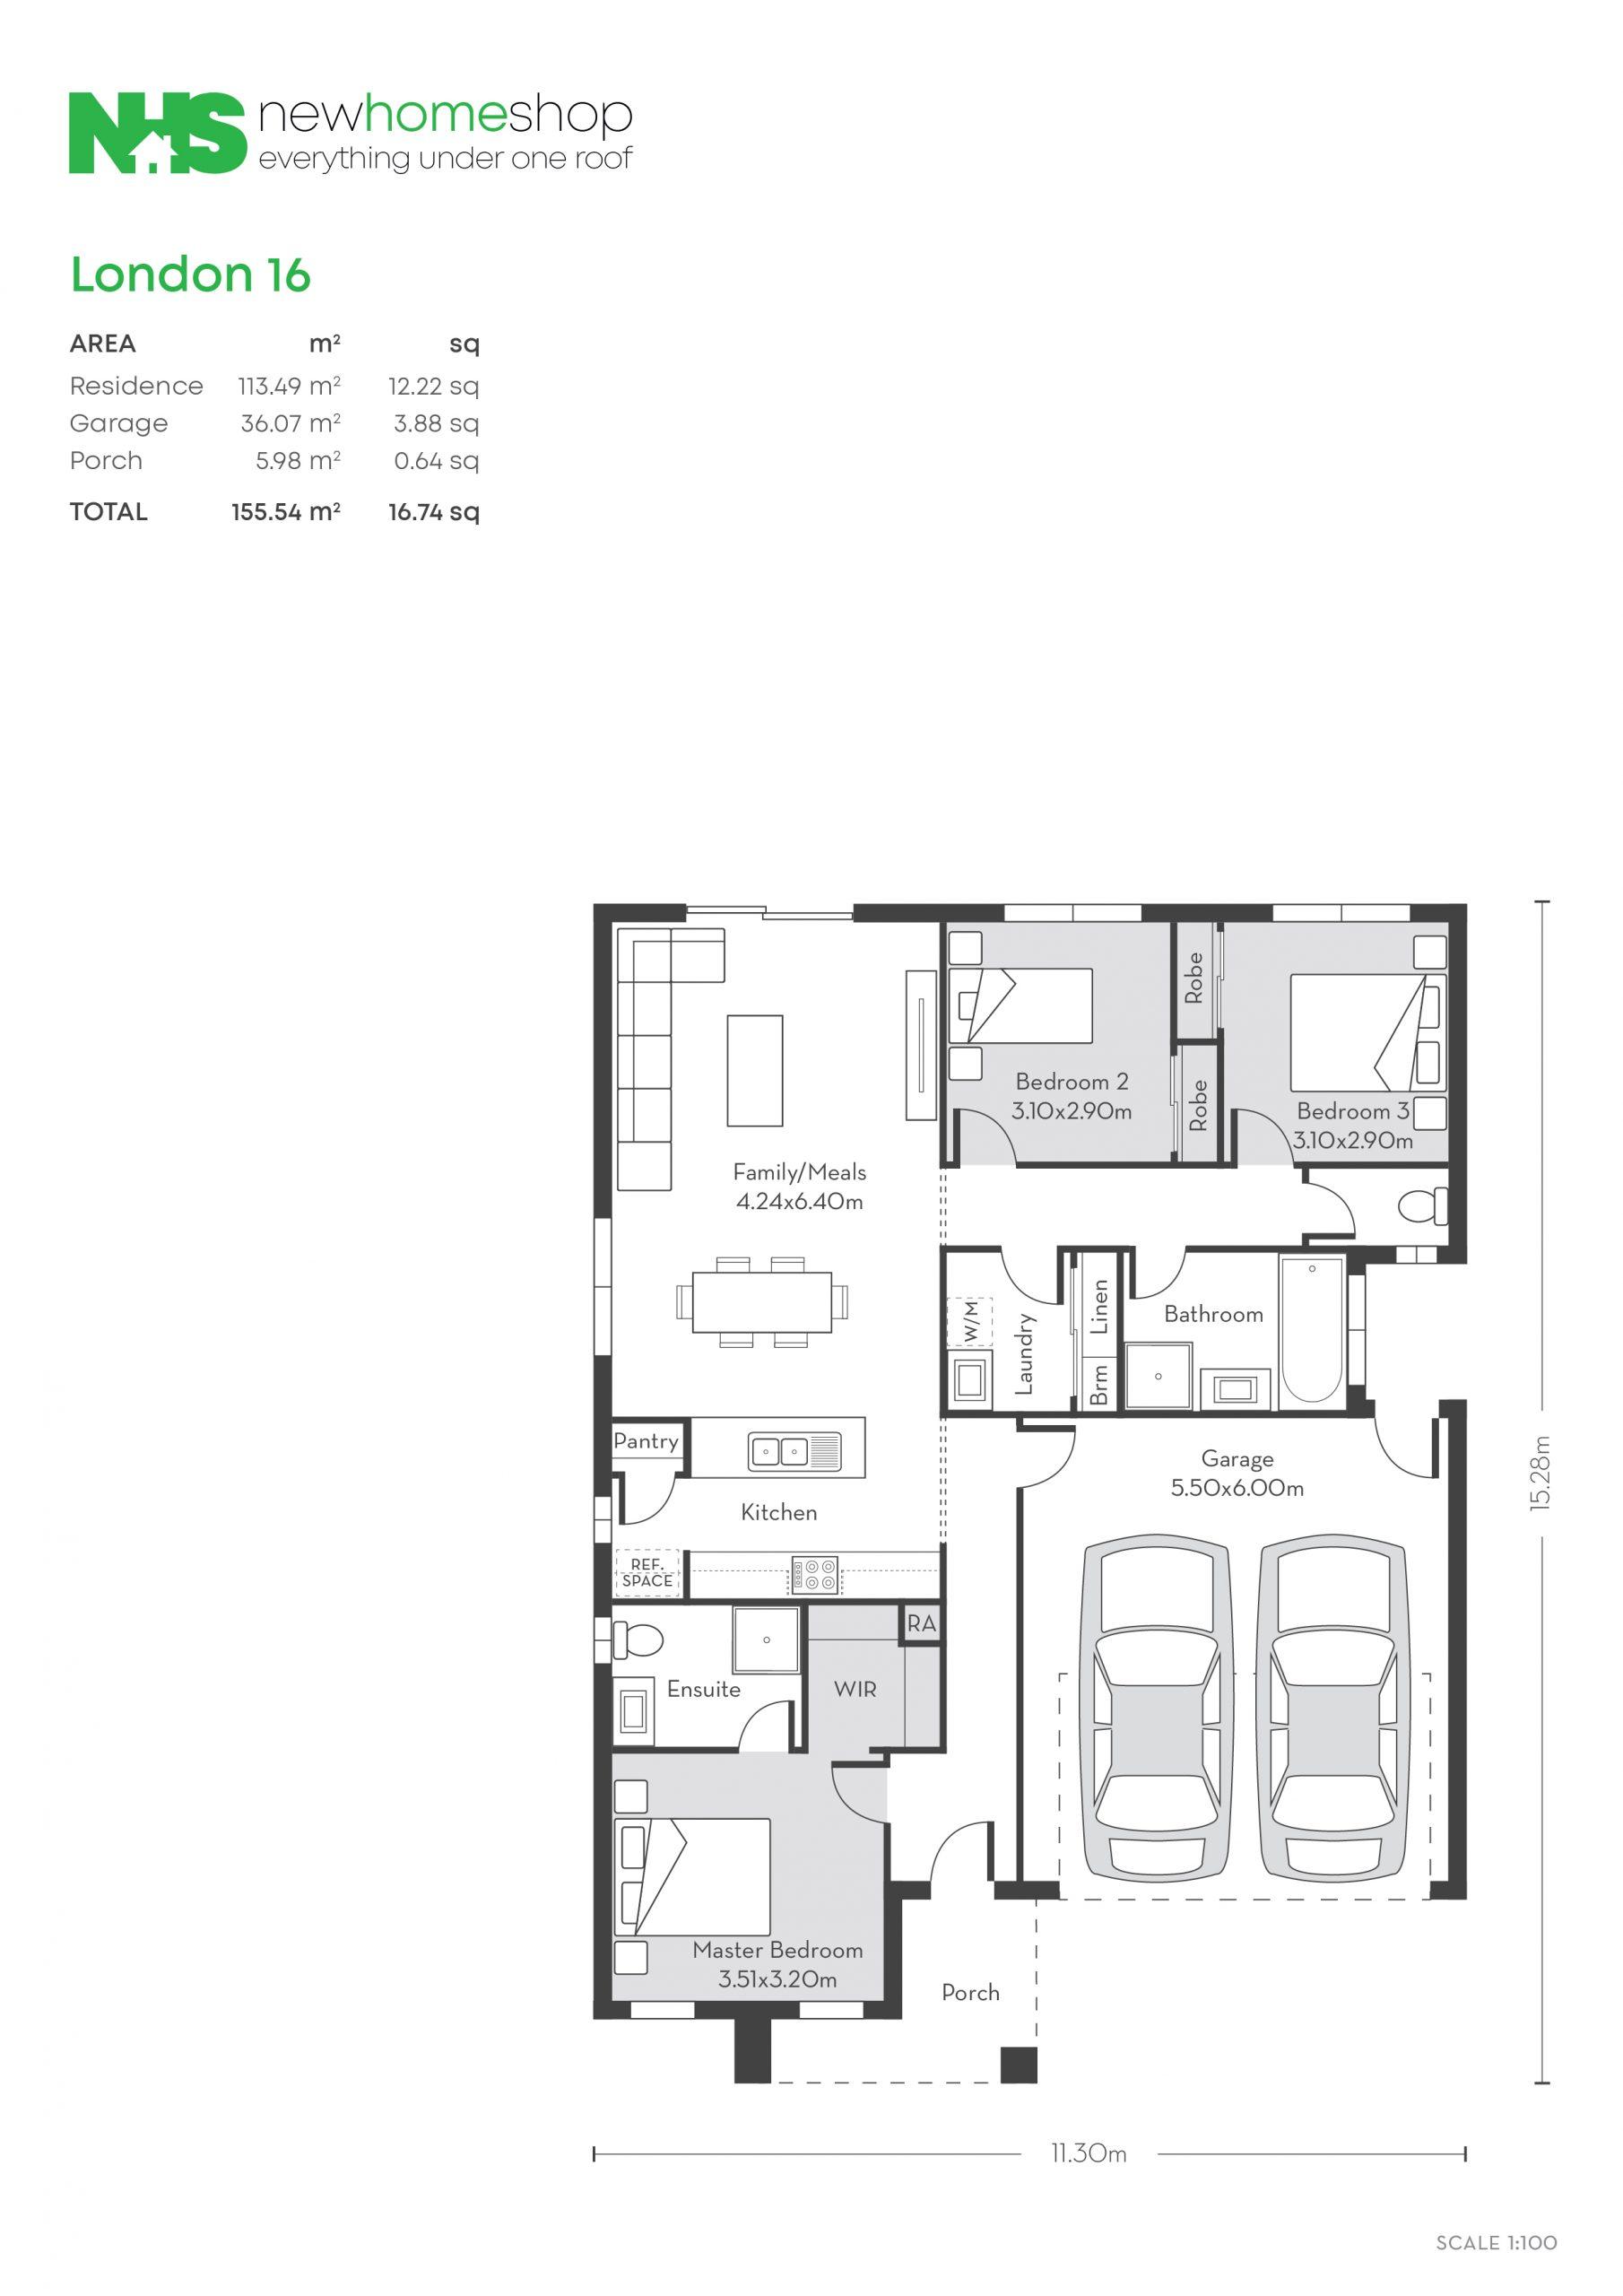 Lot 646 Westbury Avenue